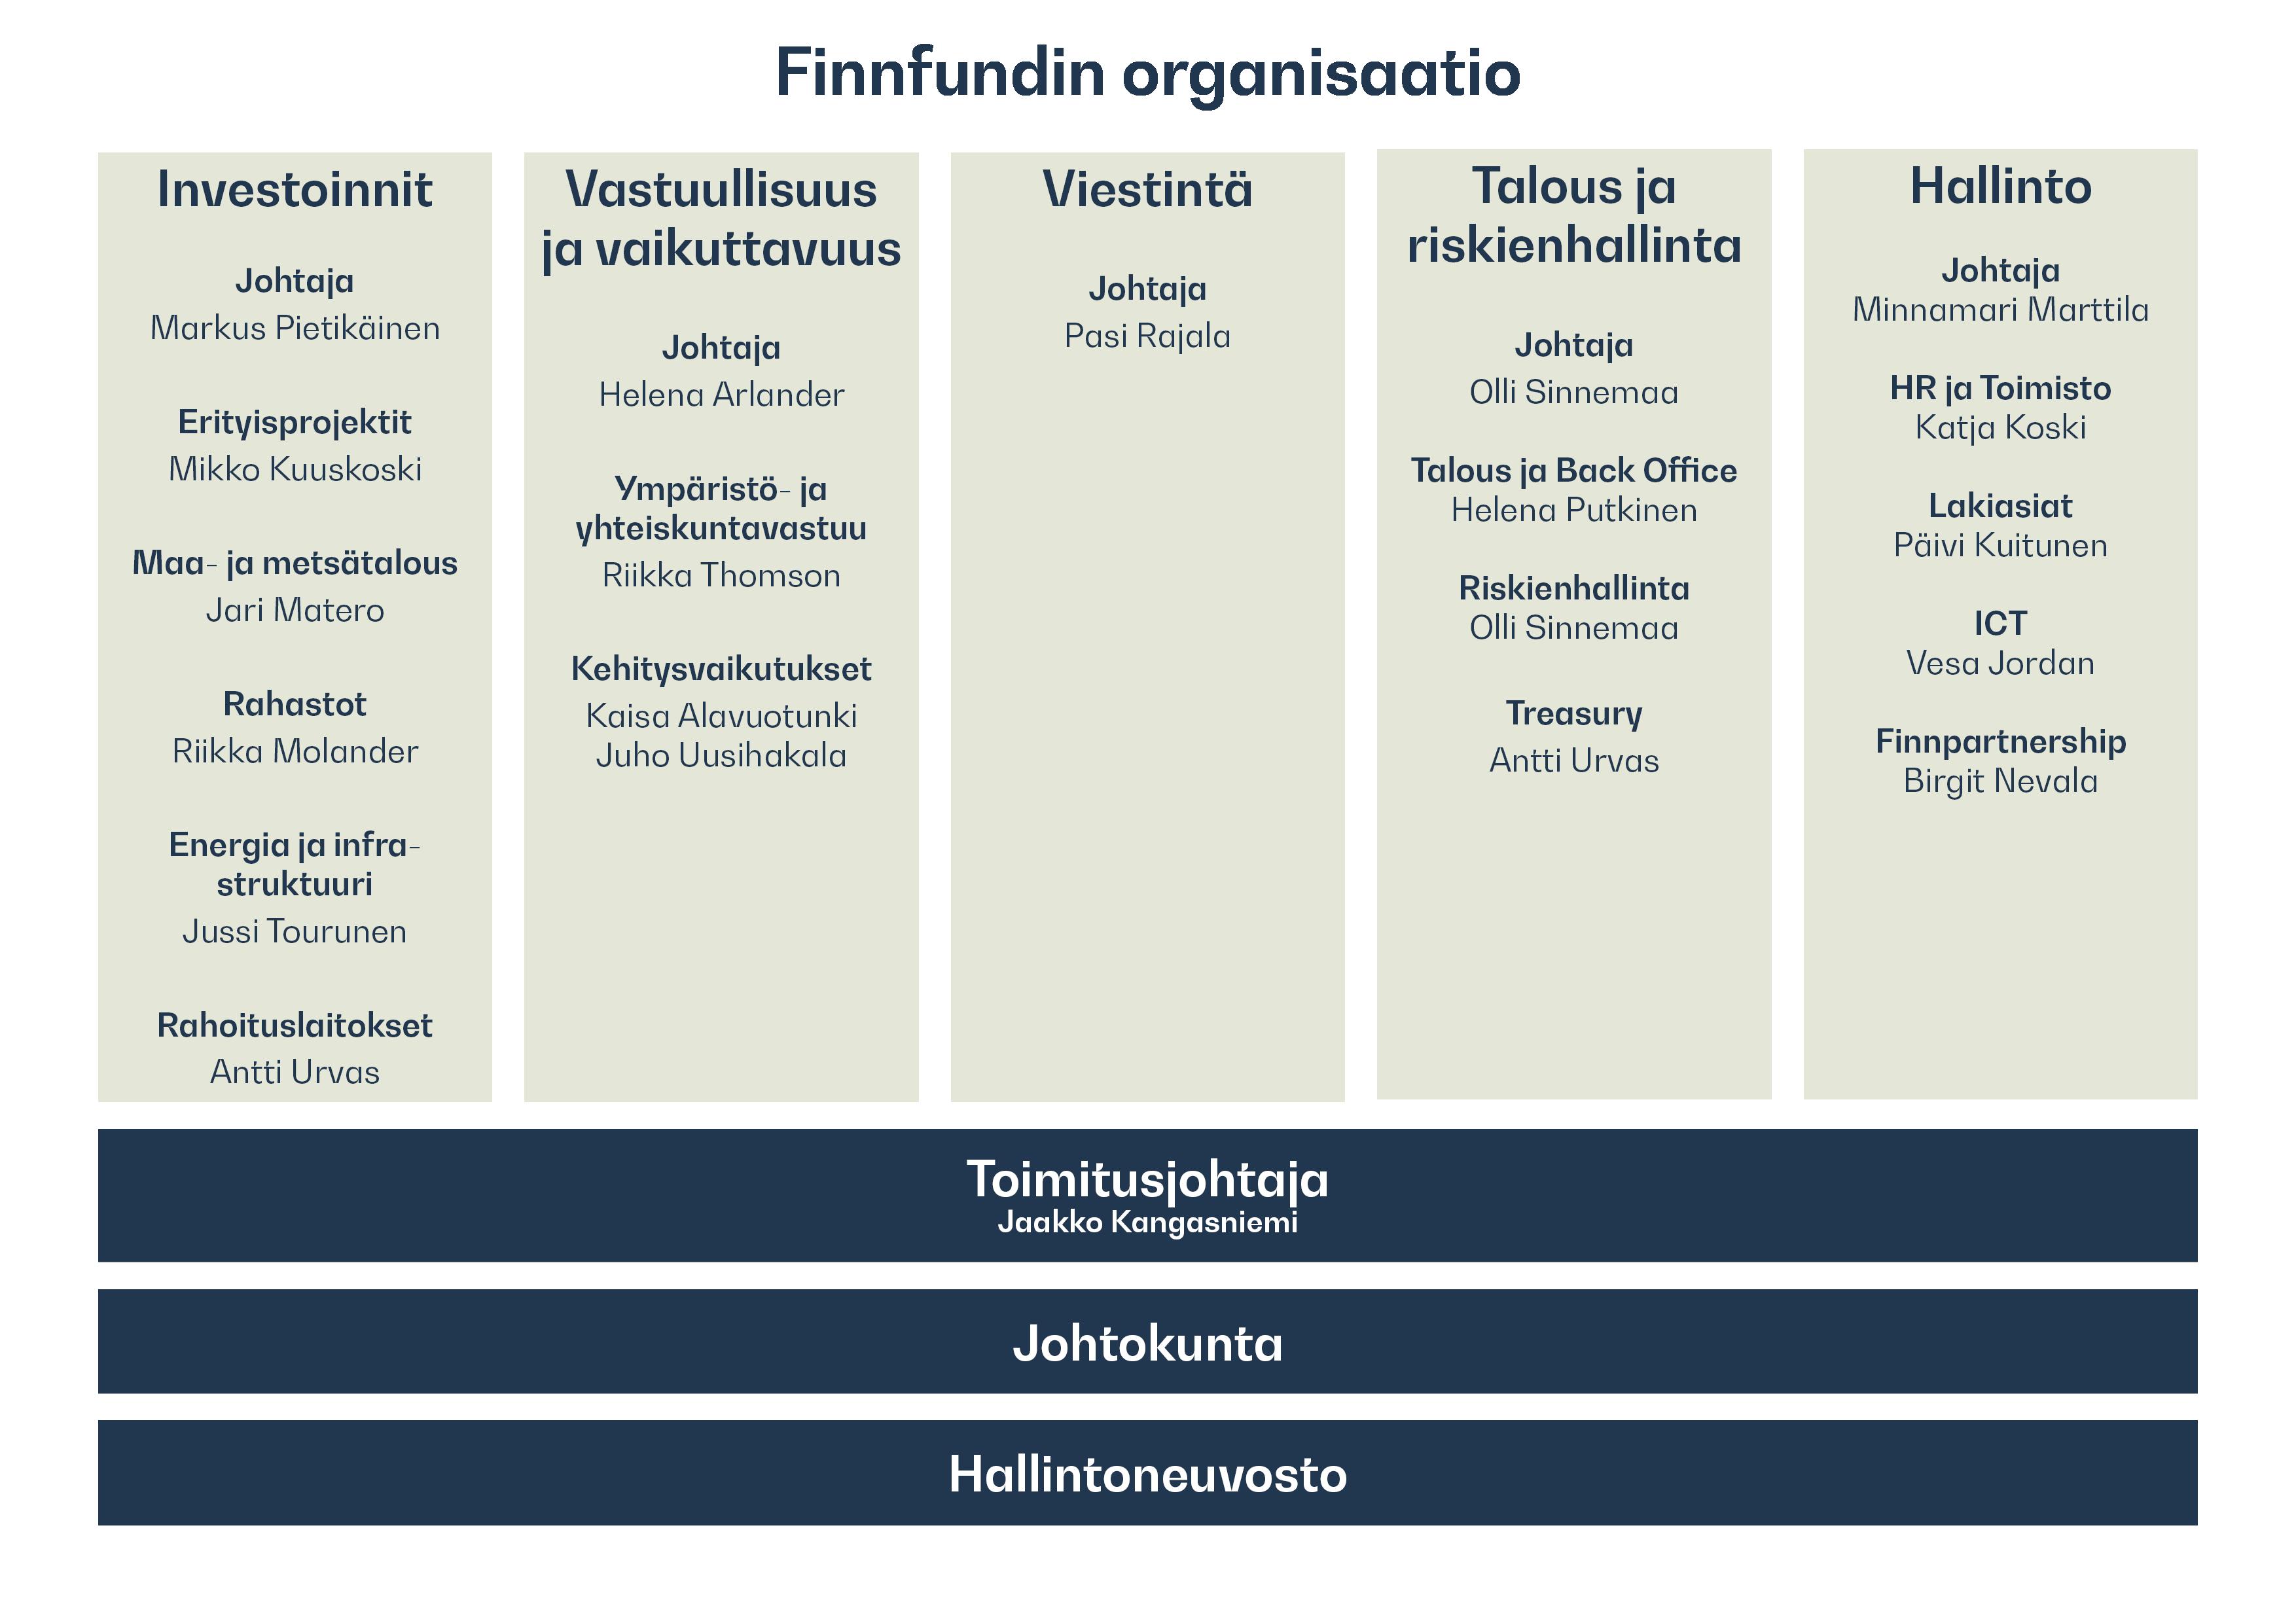 Finnfundin organisaatiorakenne